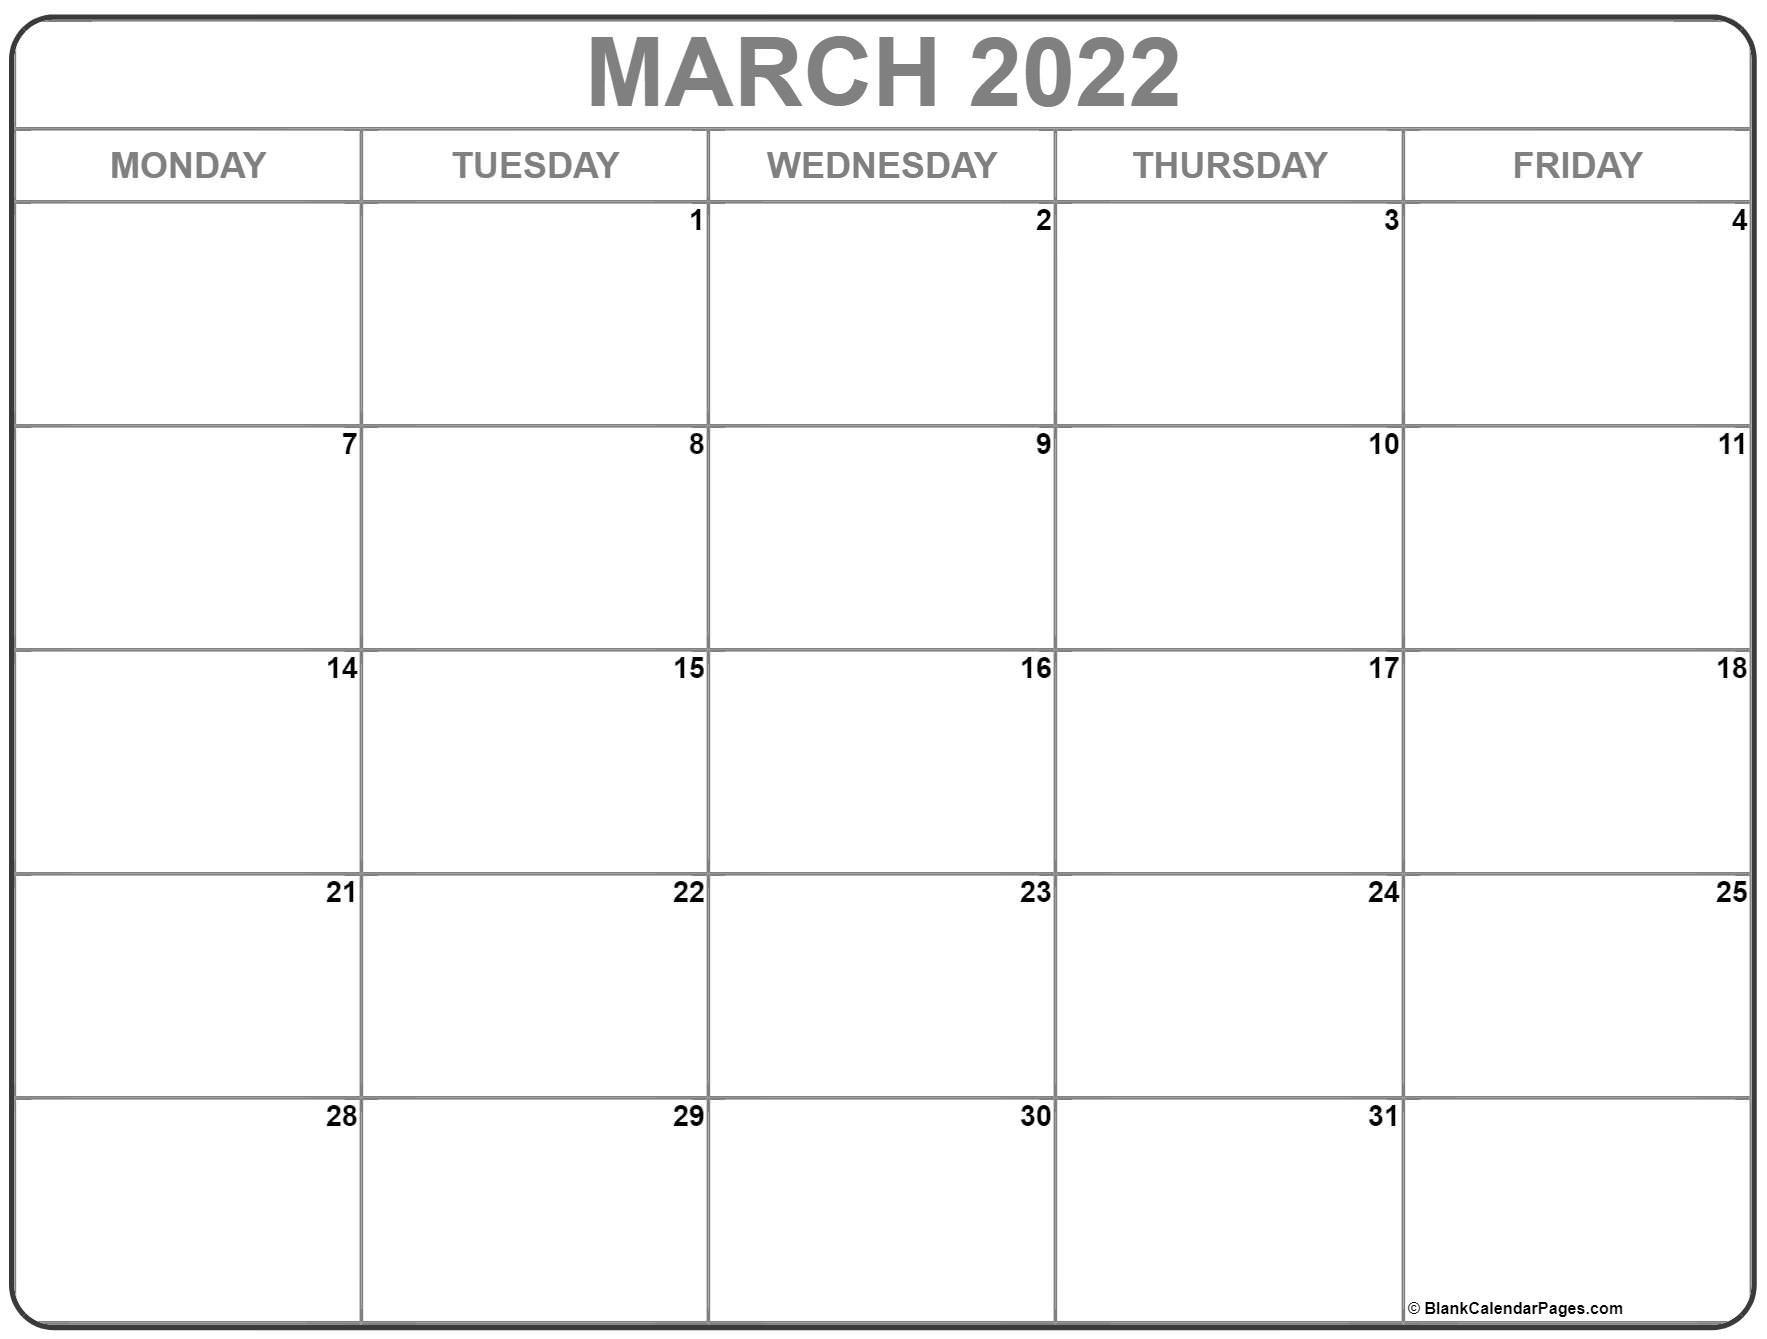 March 2022 Monday Calendar | Monday To Sunday Monday Through Friday Calendar Monthly